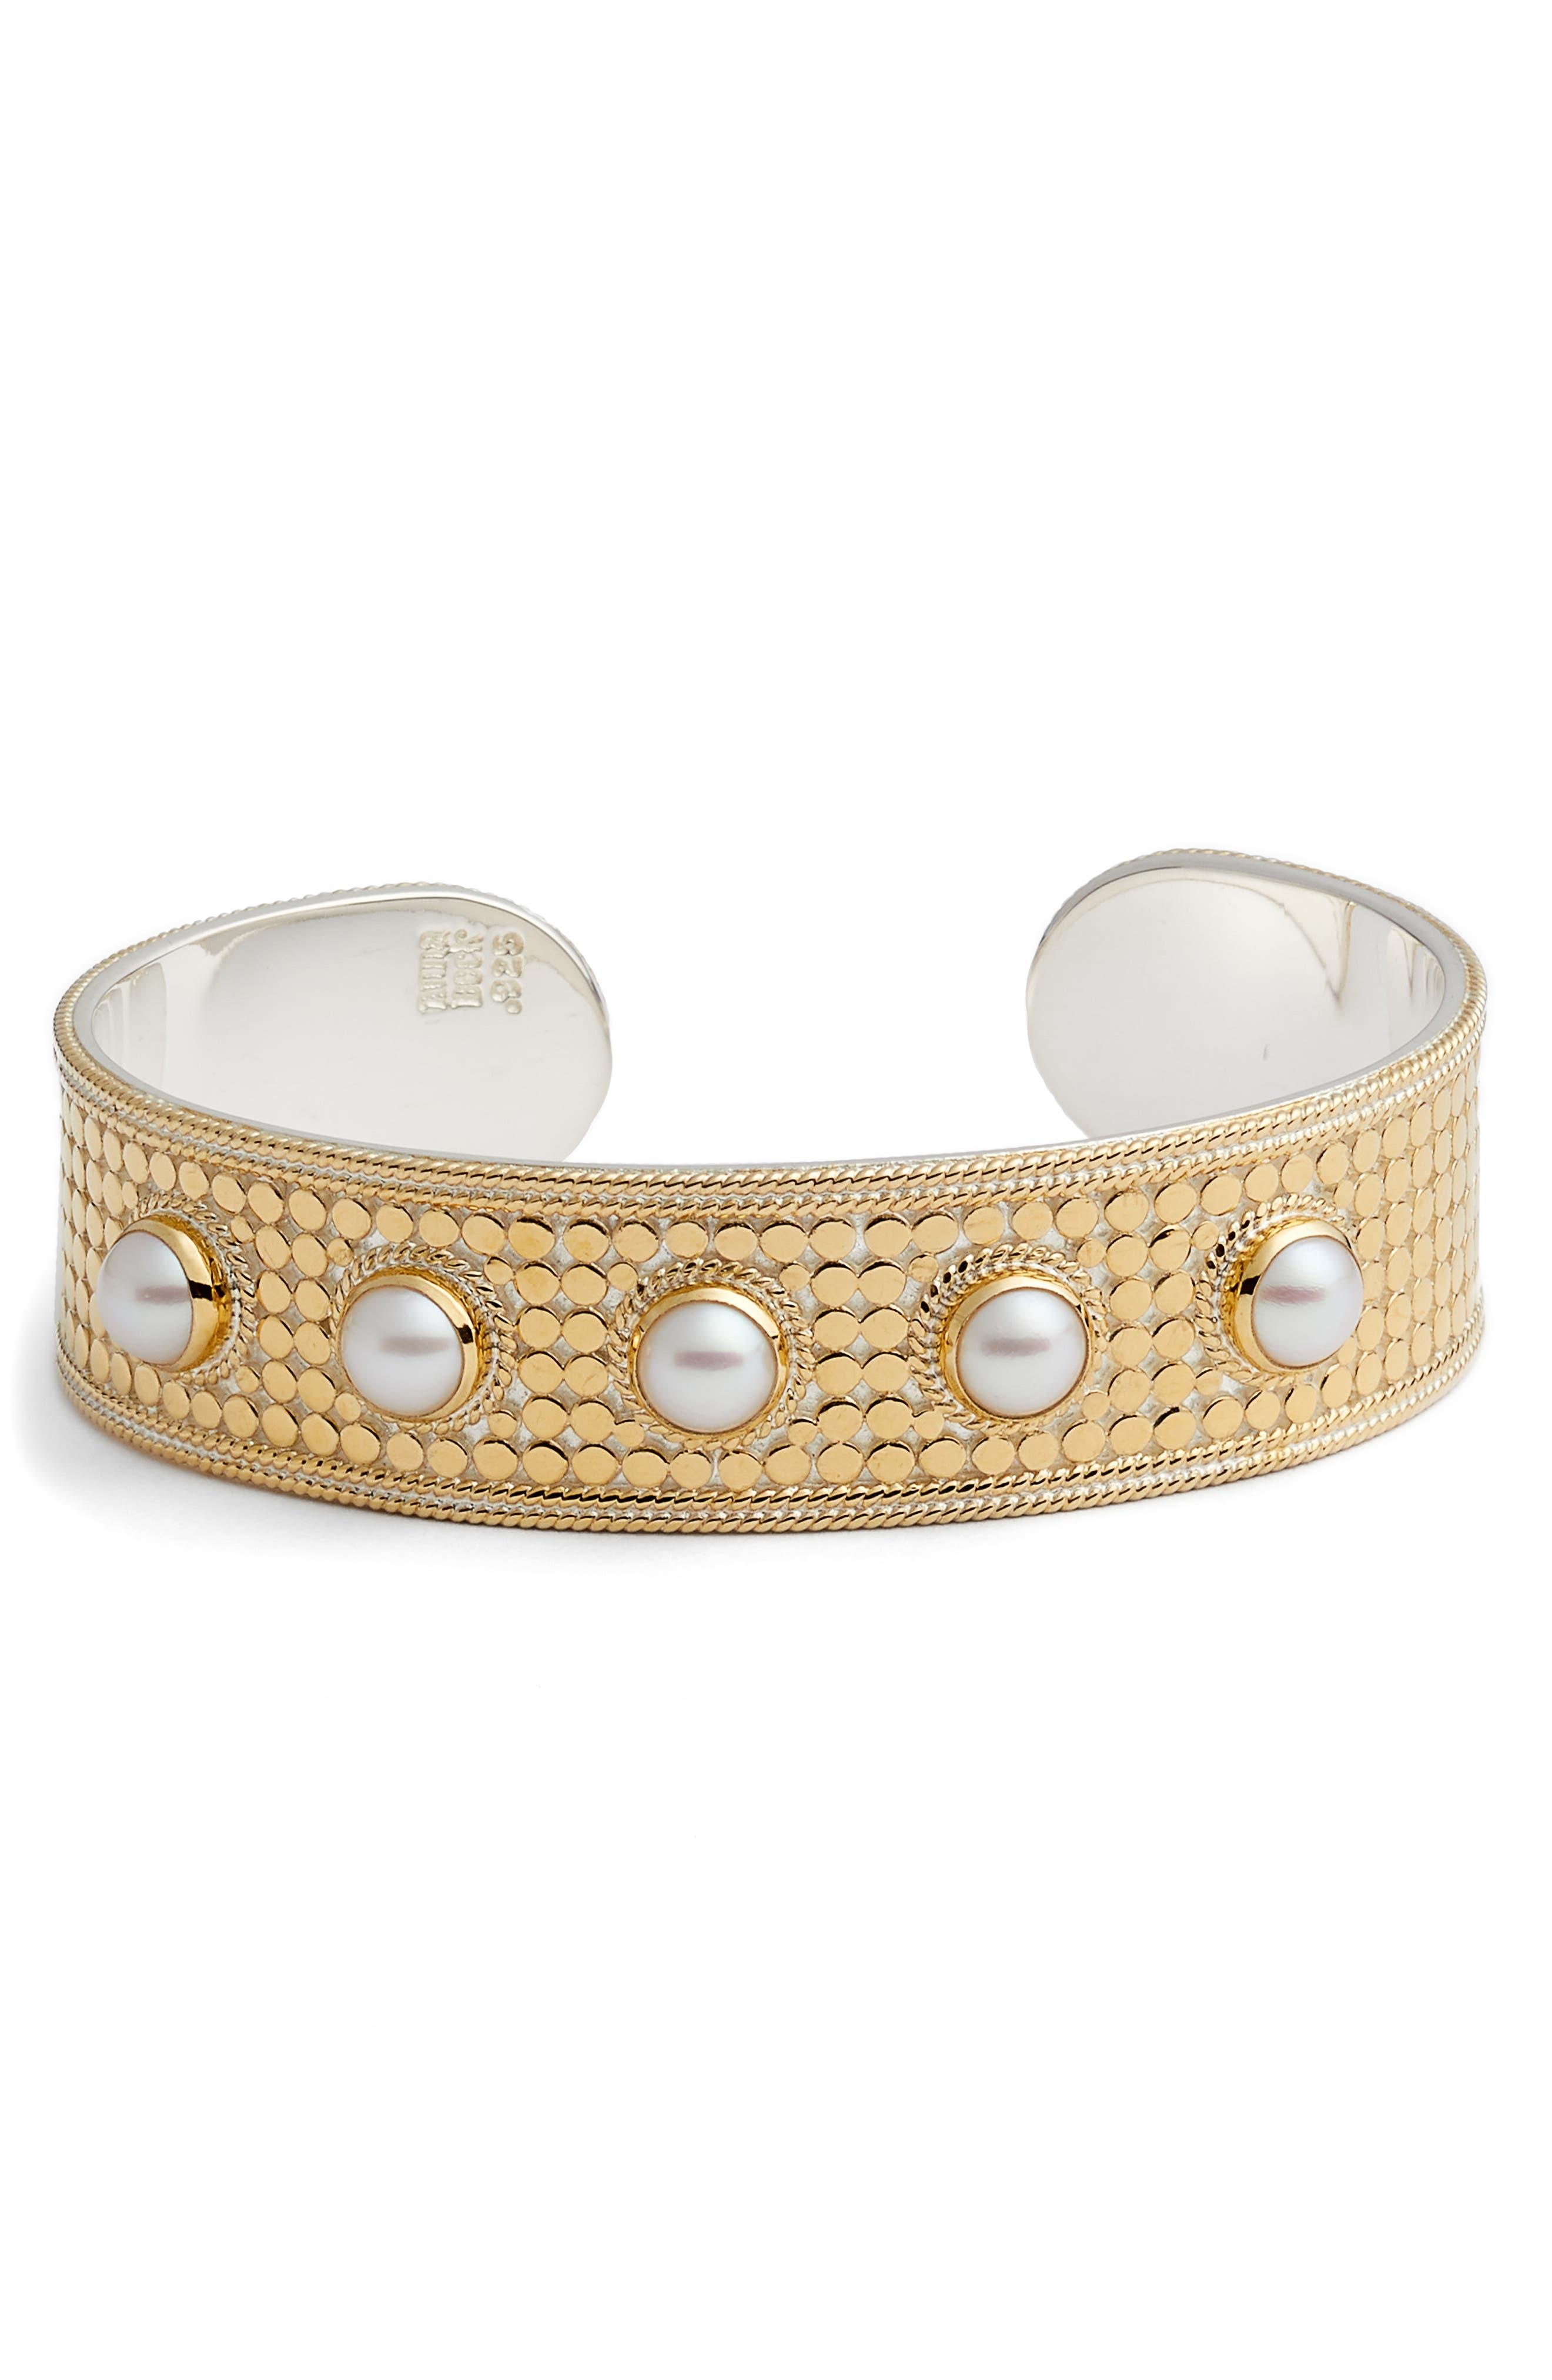 Medium Pearl Cuff Bracelet,                         Main,                         color, GOLD/ PEARL